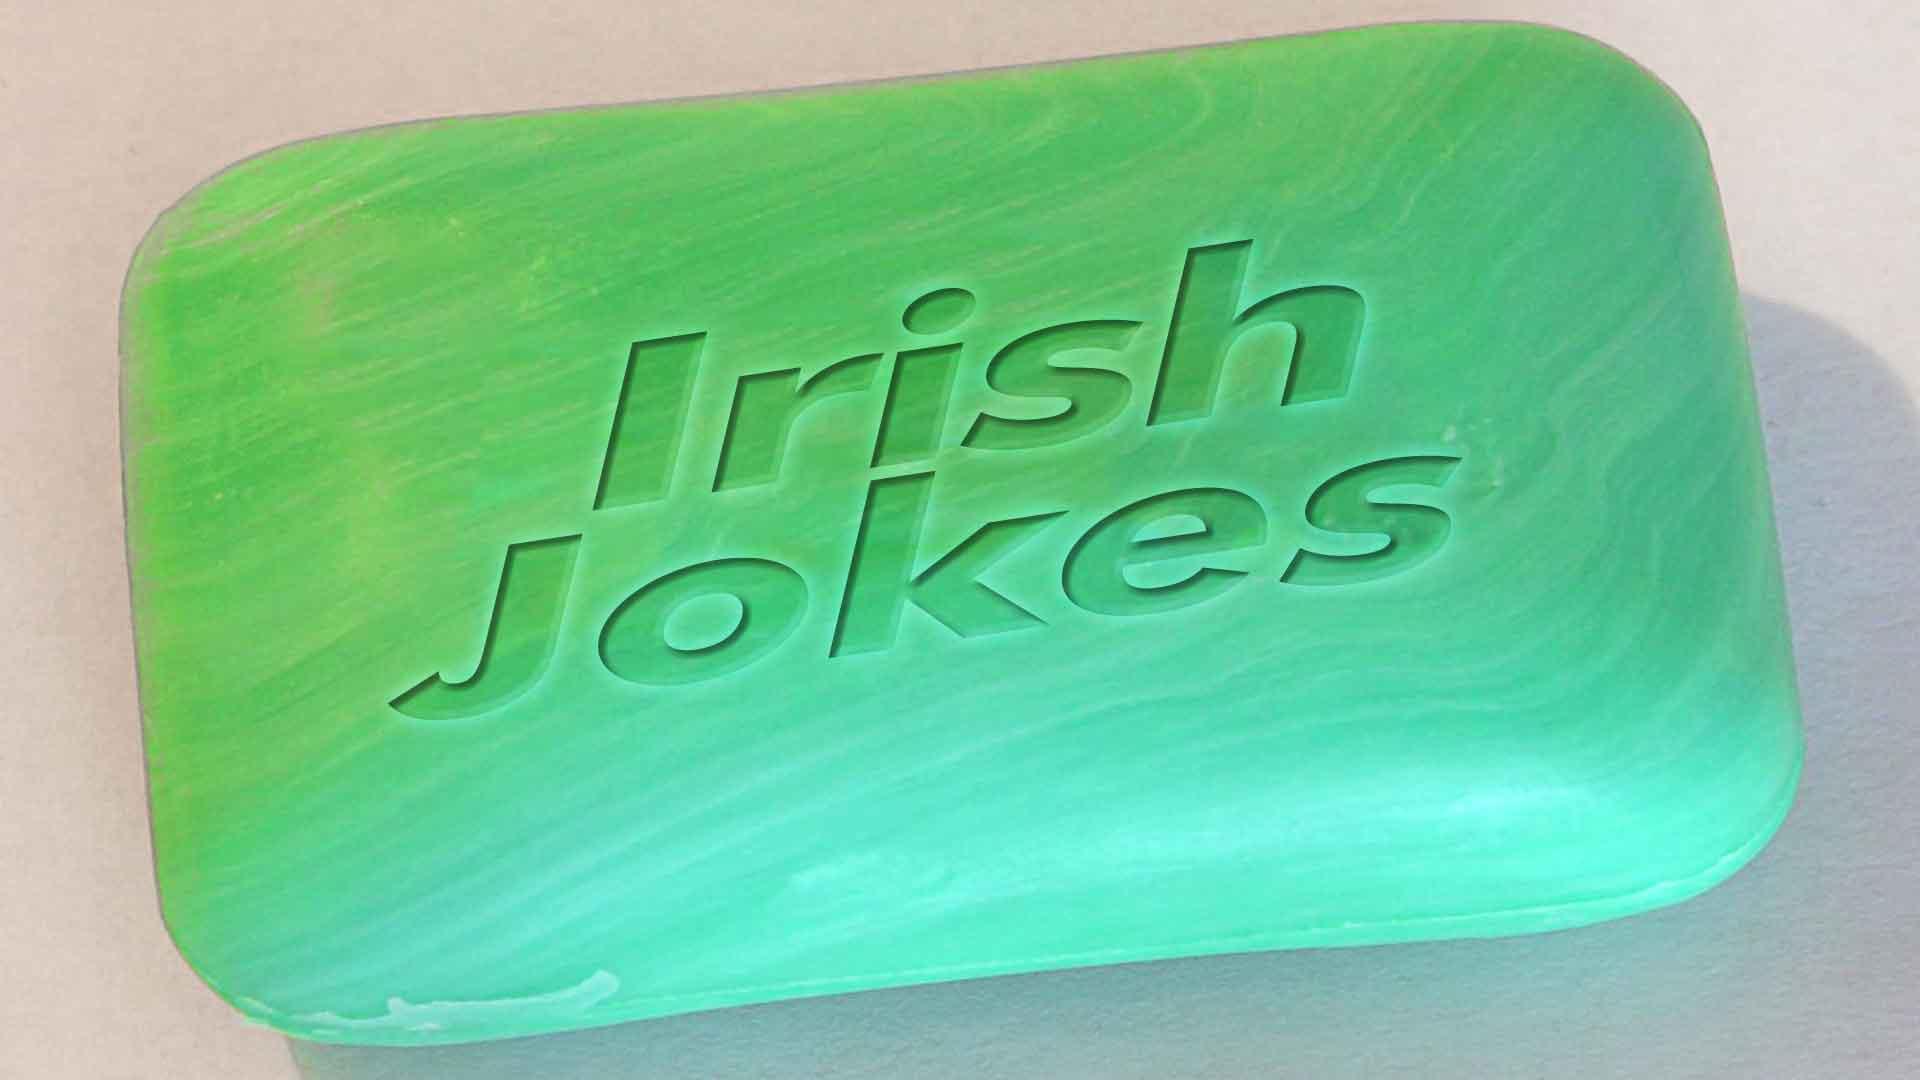 22 Really Funny <b>Irish Jokes</b> That Will Make You Smile